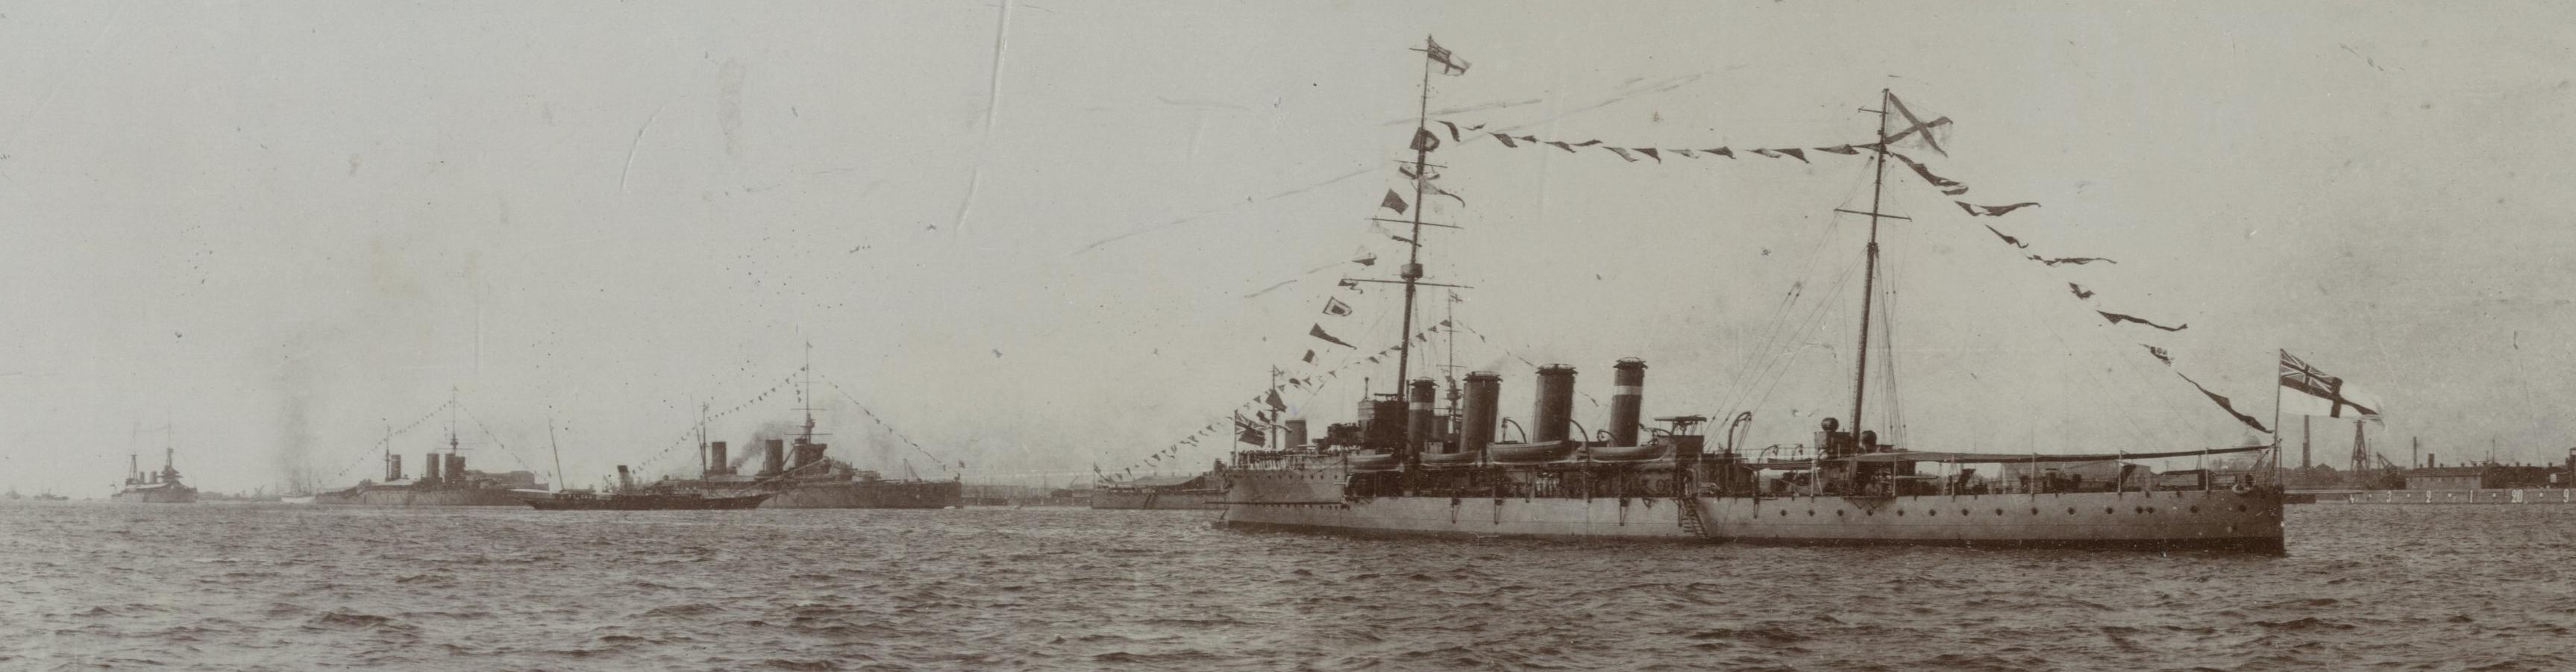 1st_Battlecruiser_Squadron_in_Kronstadt_June_1914.png